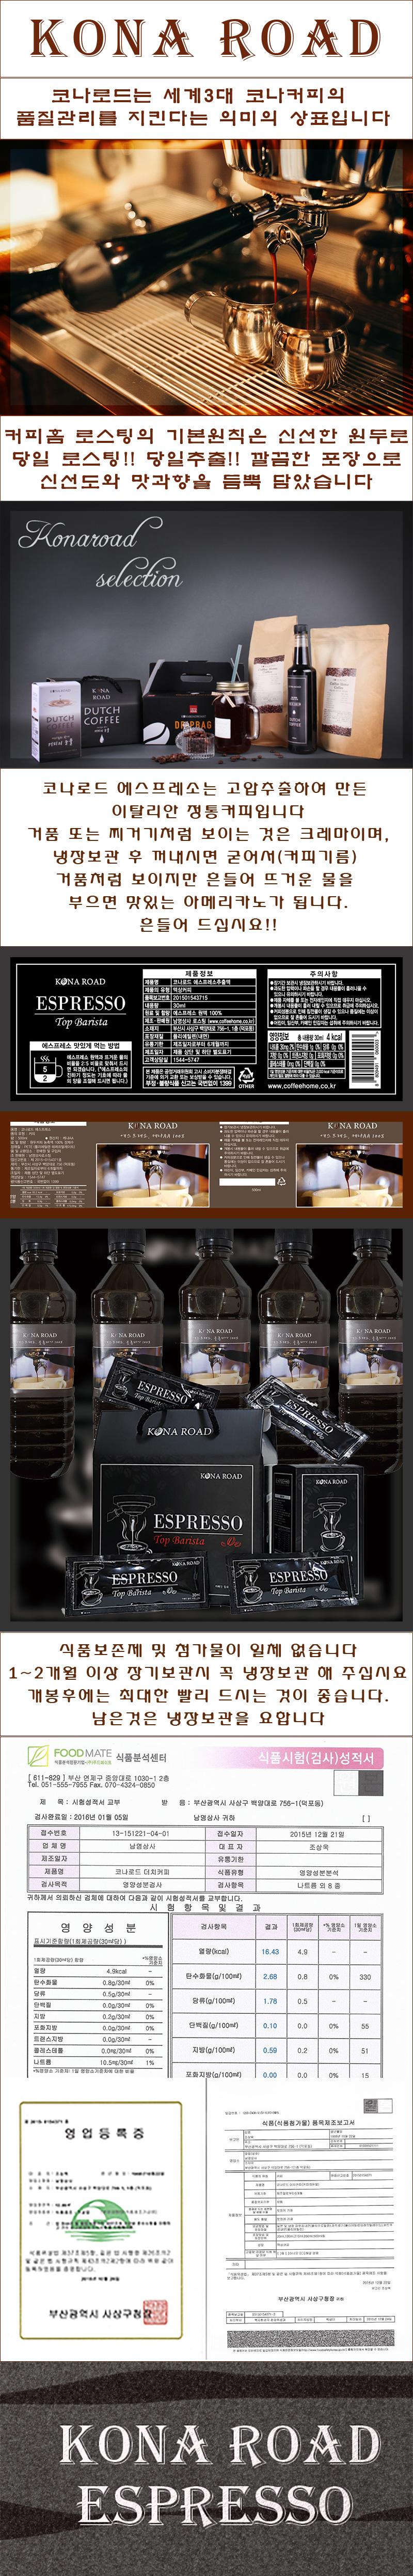 copy-1531792873-konaroad_espresso.jpg